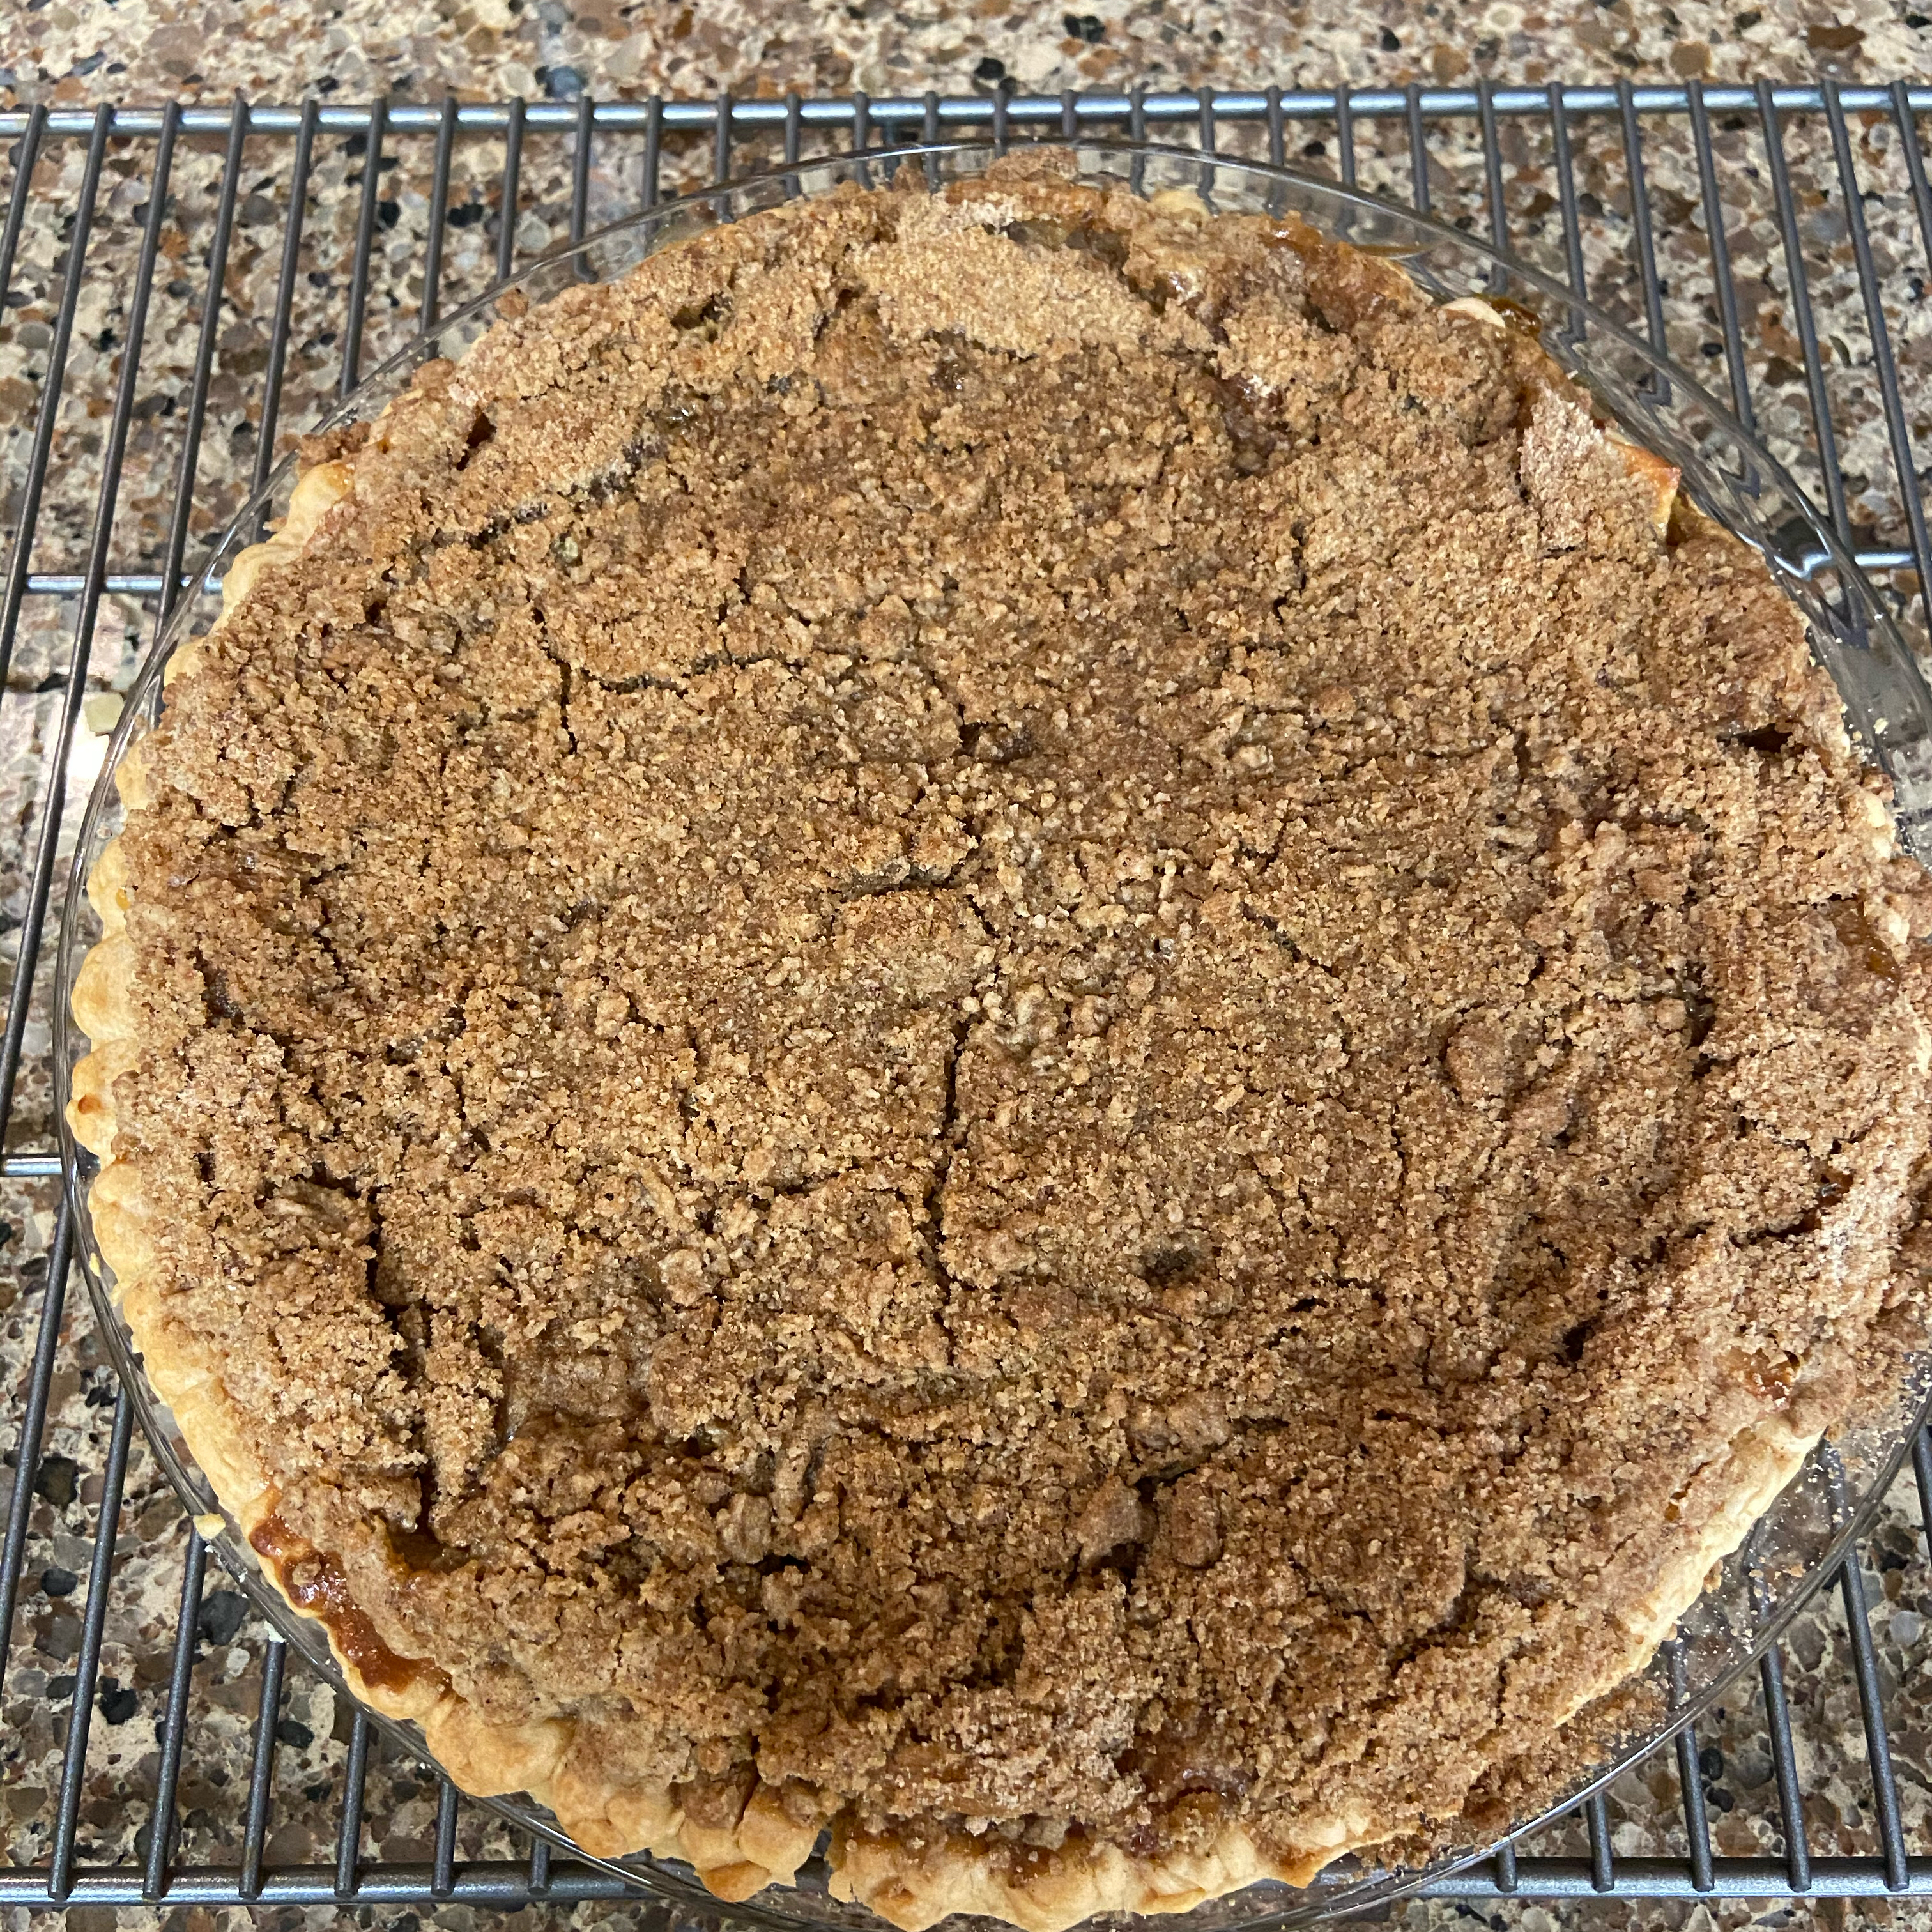 Deep Dish Ontario Apple Pie handyman24333